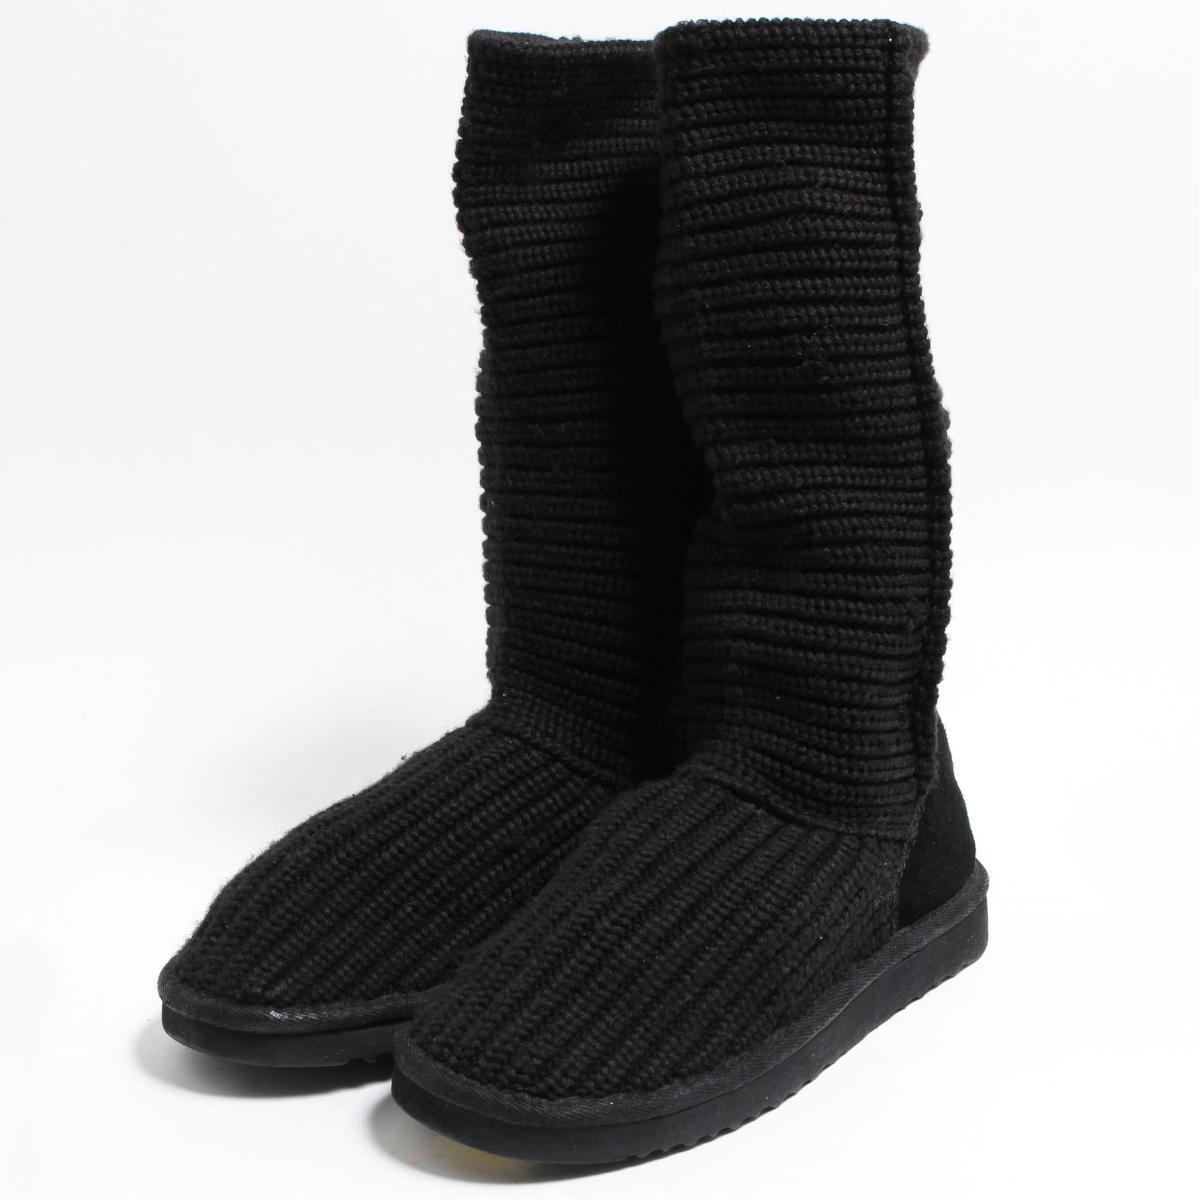 Vintage Clothing Jam アグ Ugg Classic Crochet Knit Boots Ladys